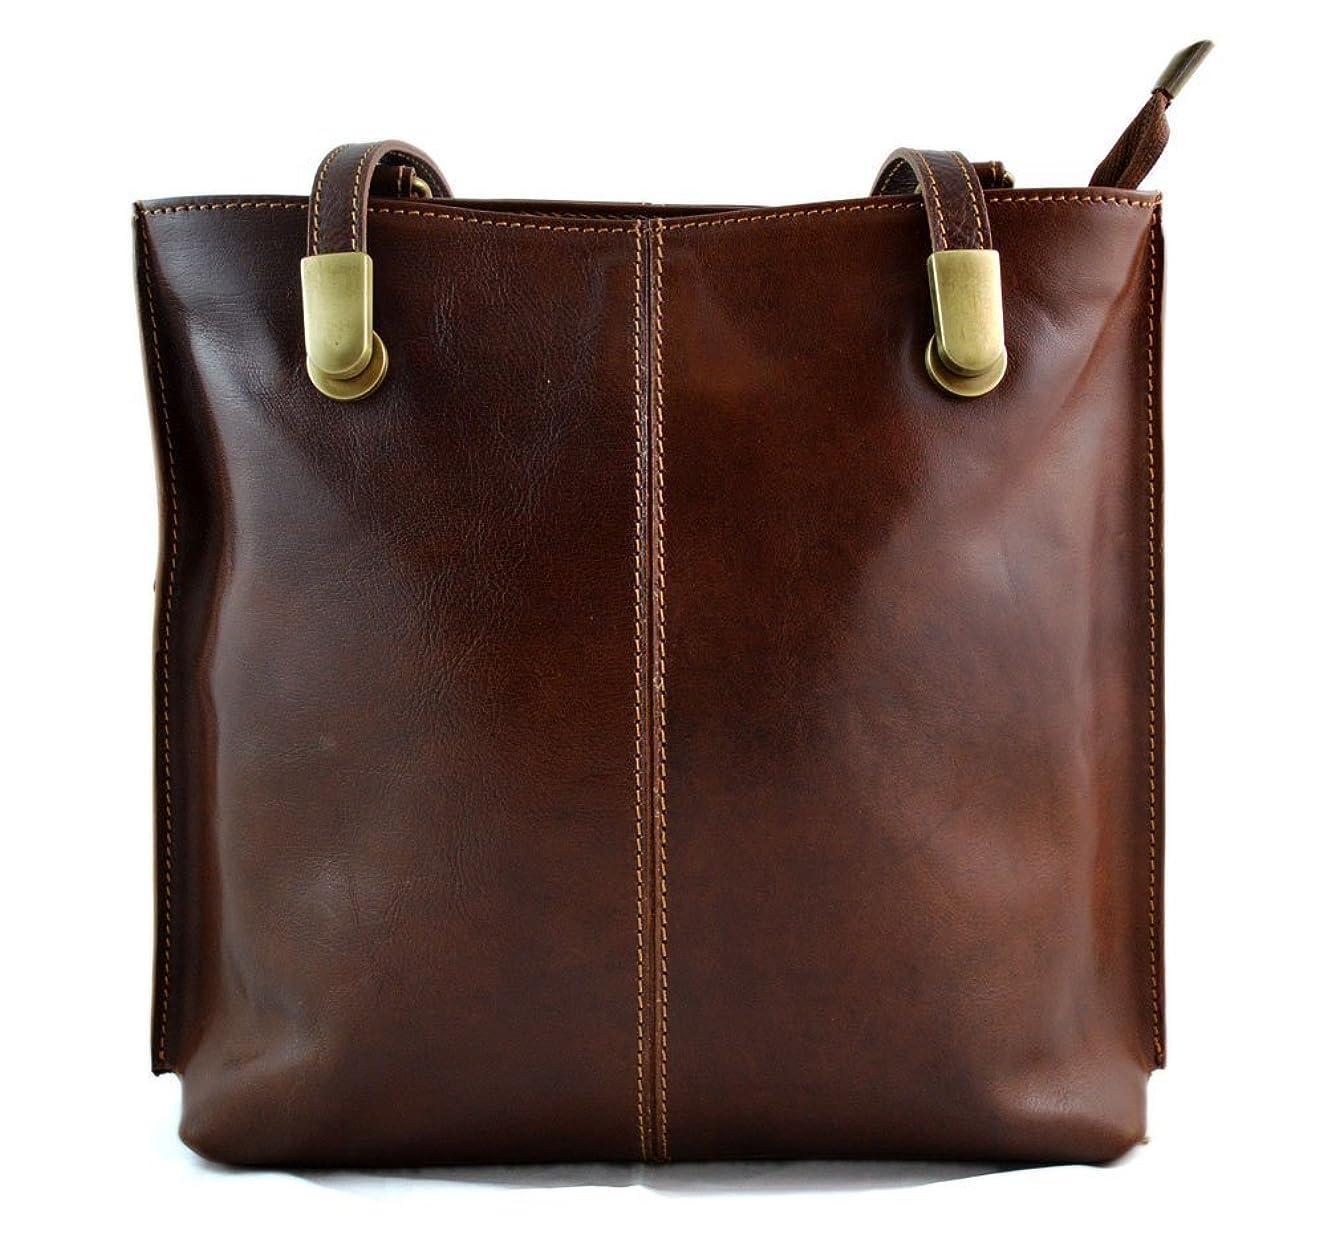 Ladies handbag leather bag clutch backpack crossbody women bag made in Italy brown